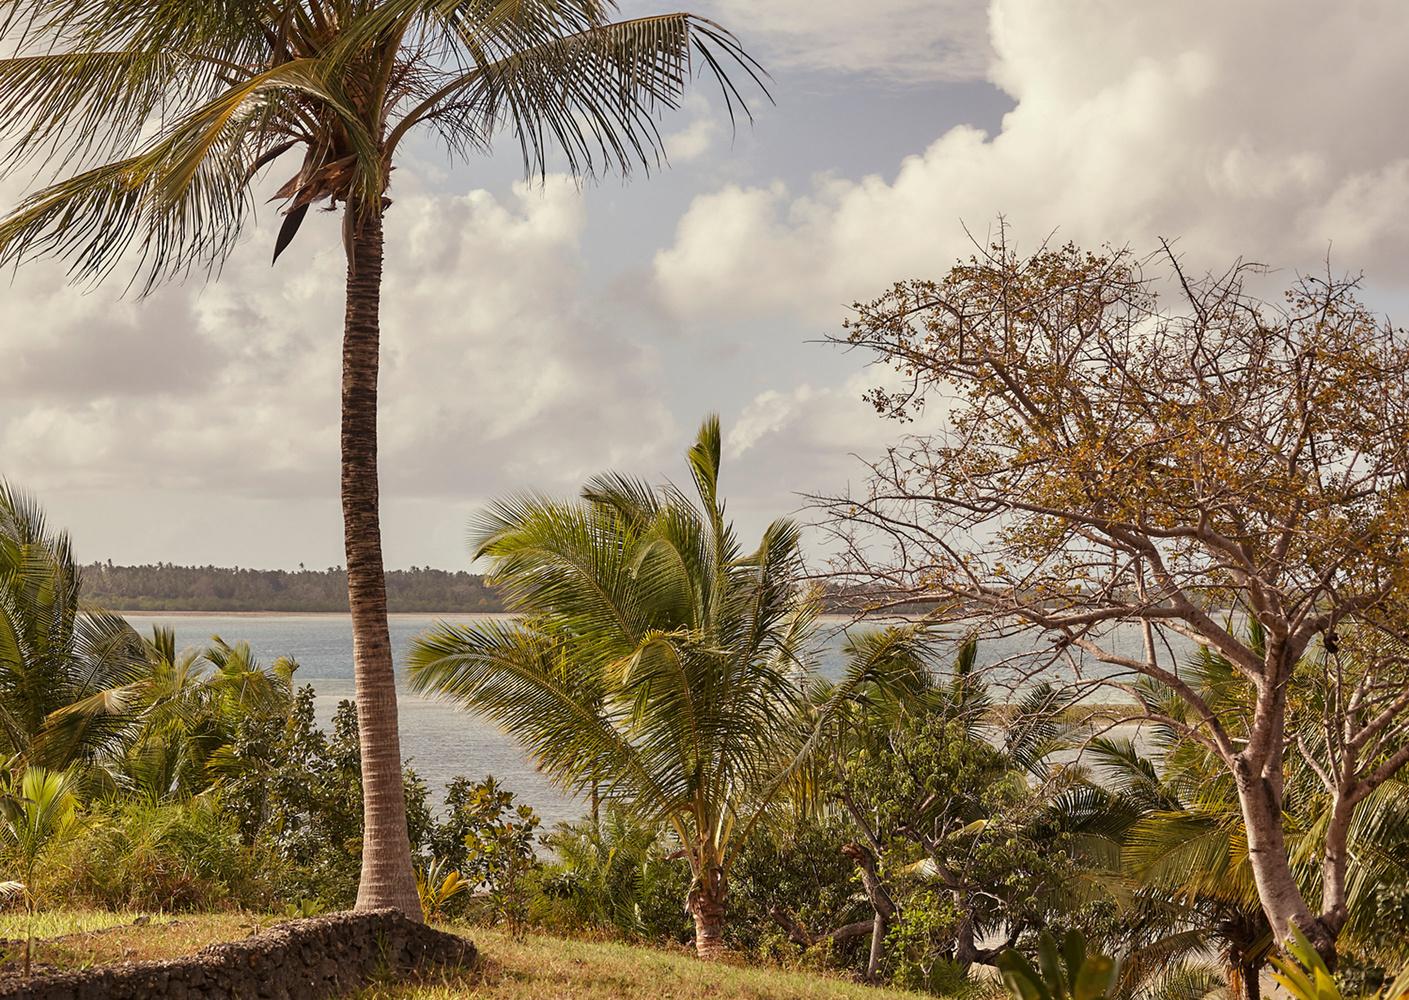 Island Life< ?php echo $image['alt']; ?>